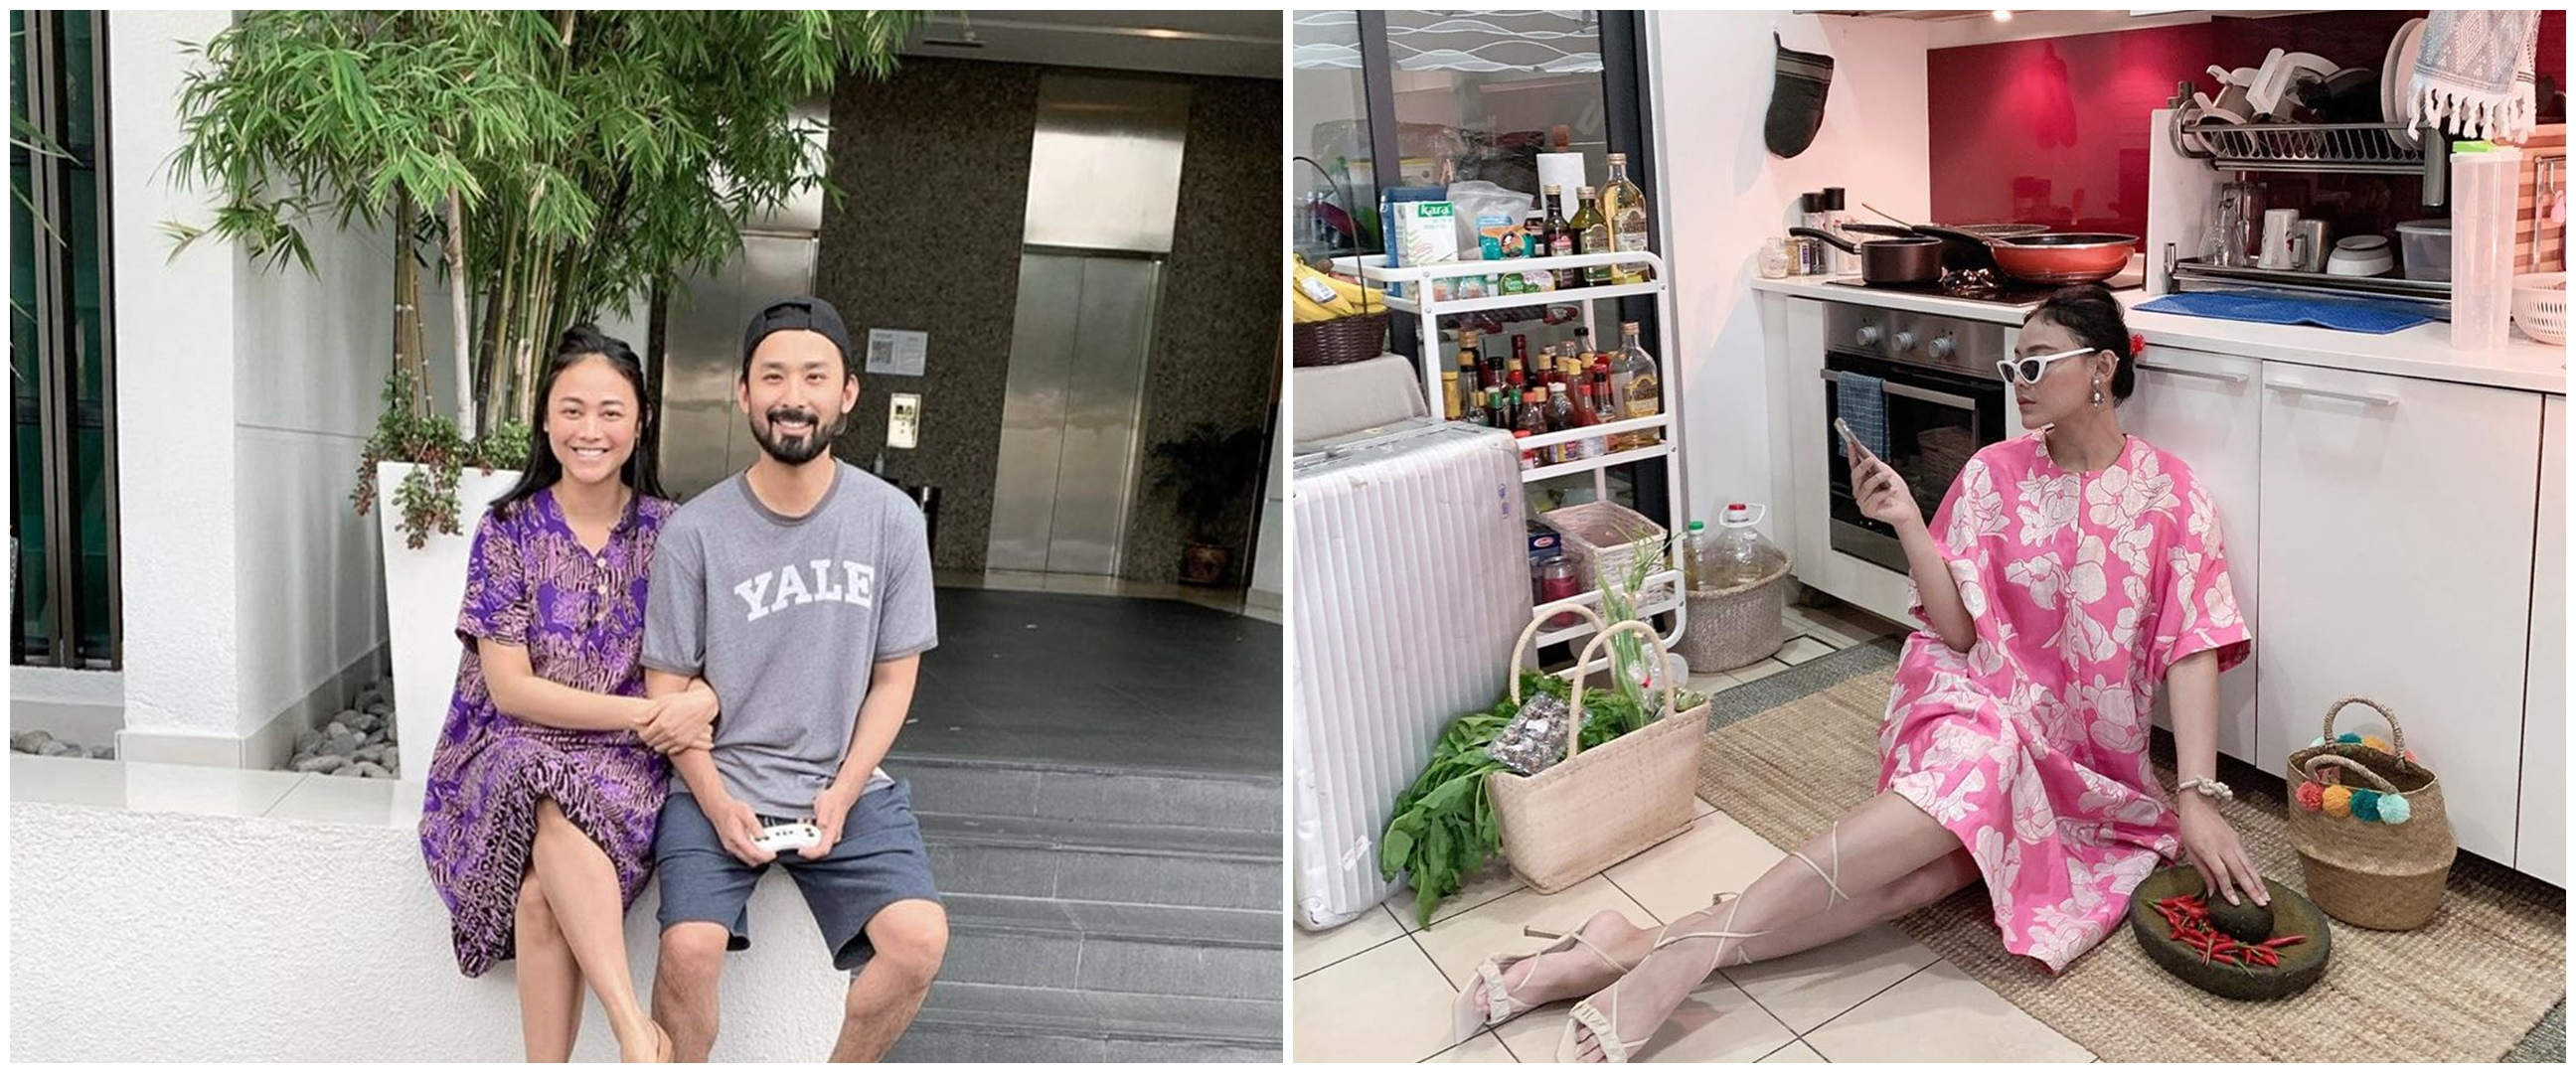 7 Potret apartemen Whulandary Herman di Malaysia, minimalis namun cozy